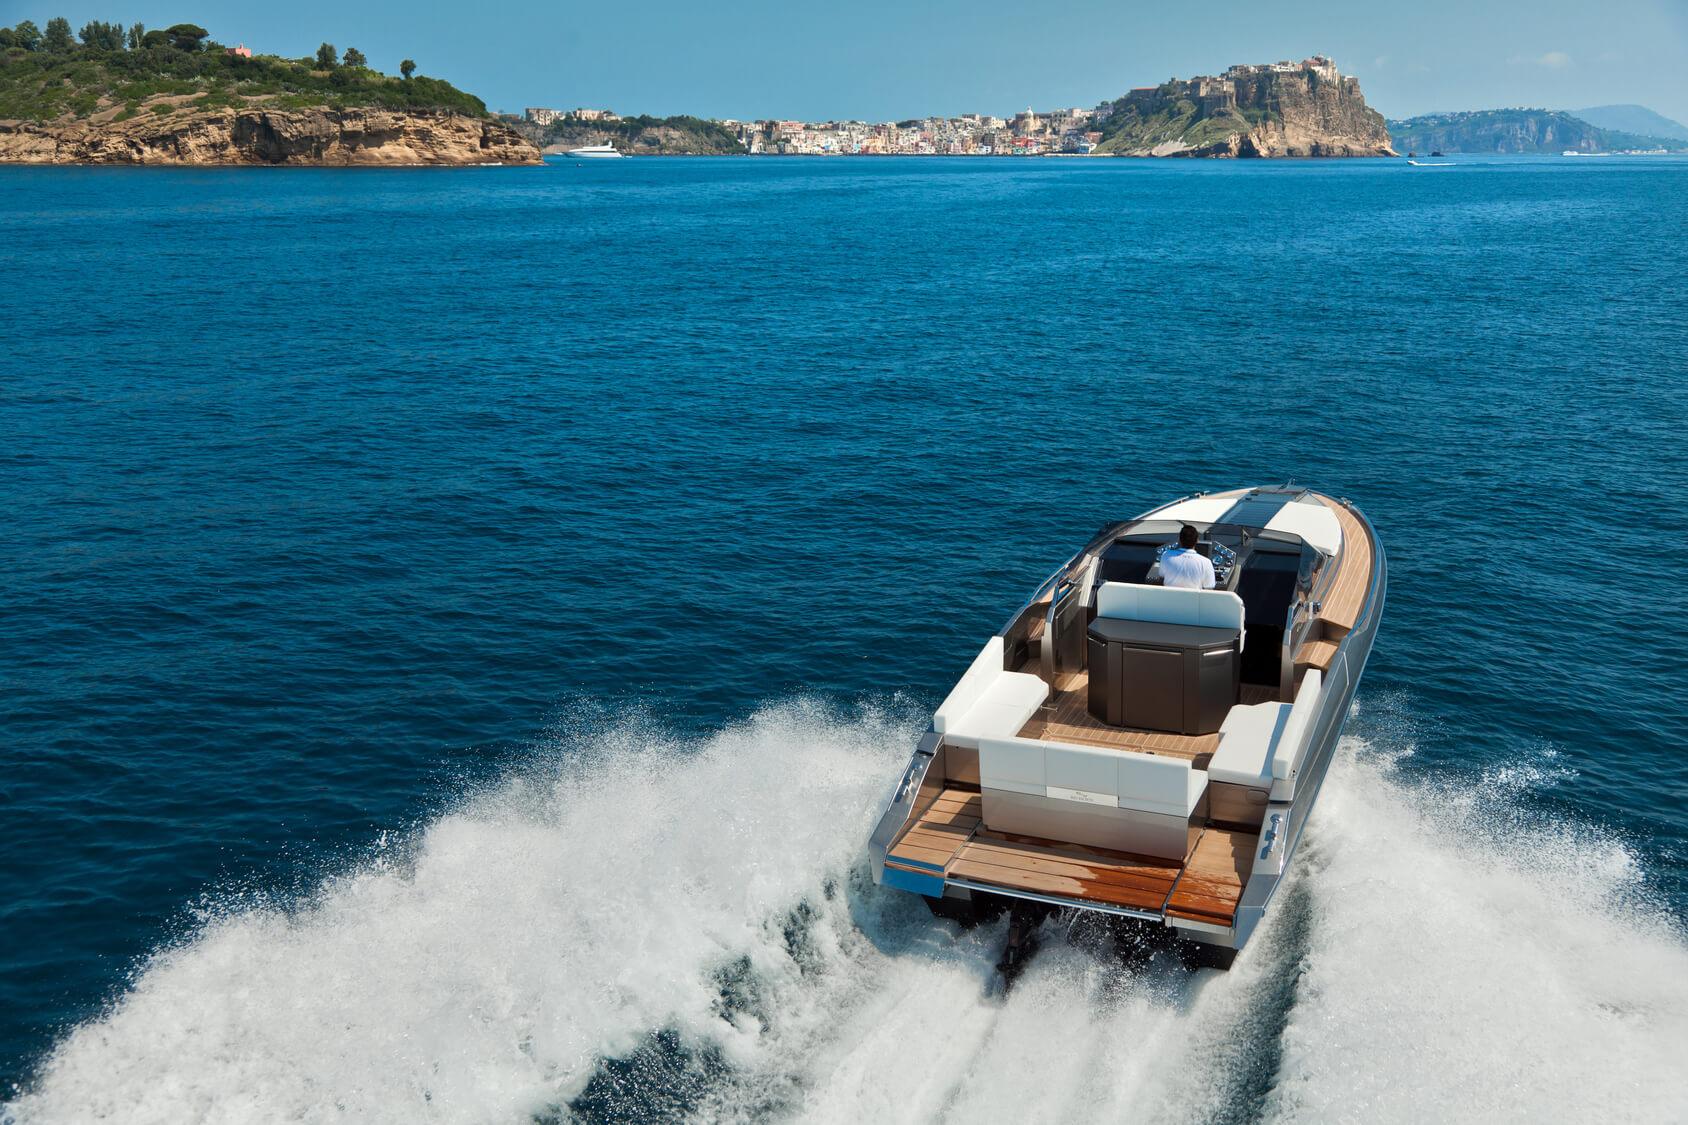 Luxury Boat - Challenor Marine Services